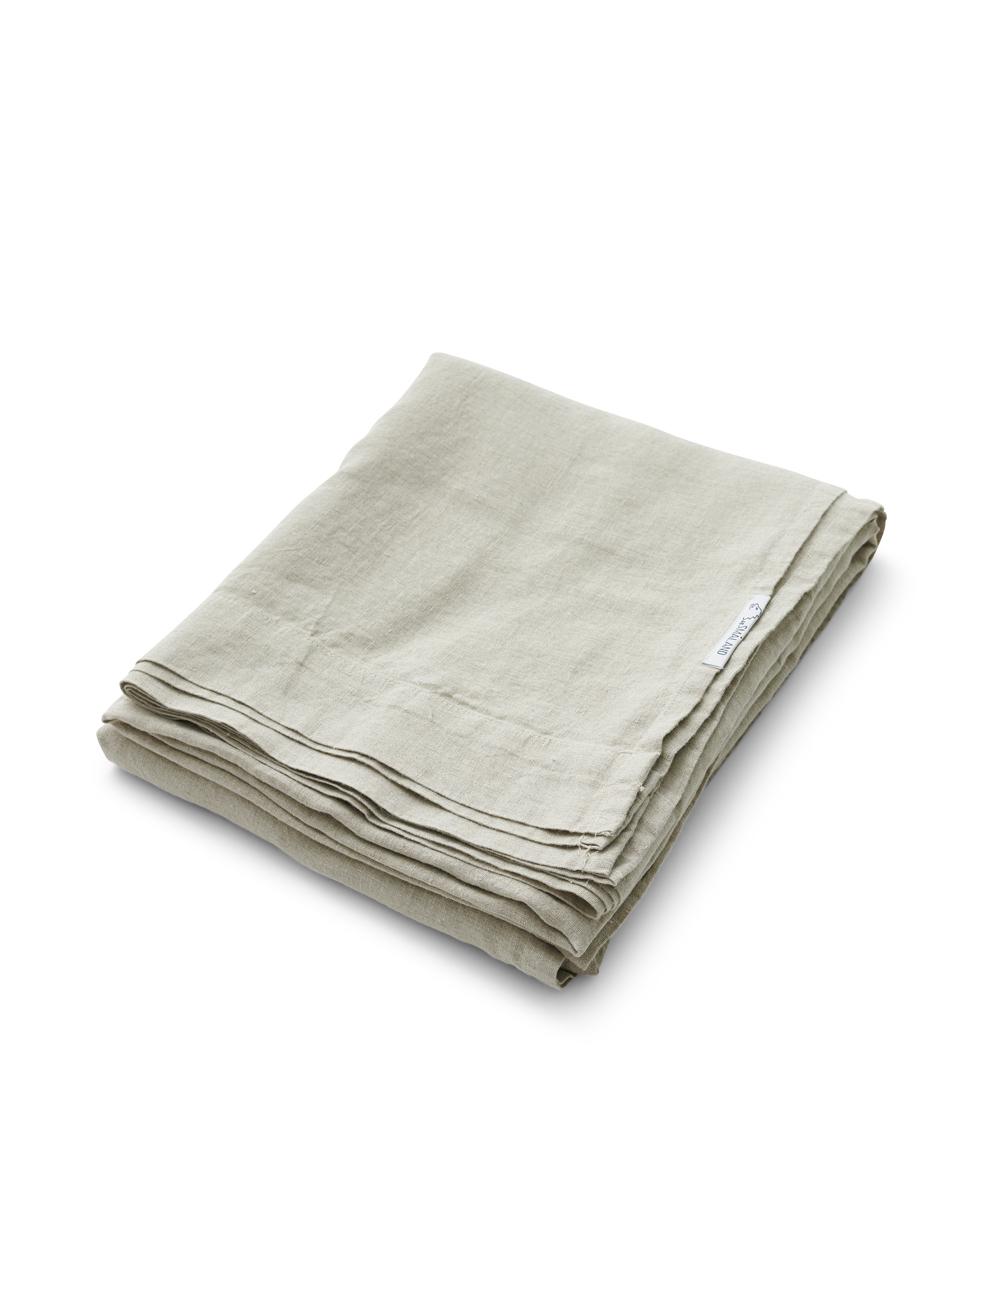 Sheets Linen Natural